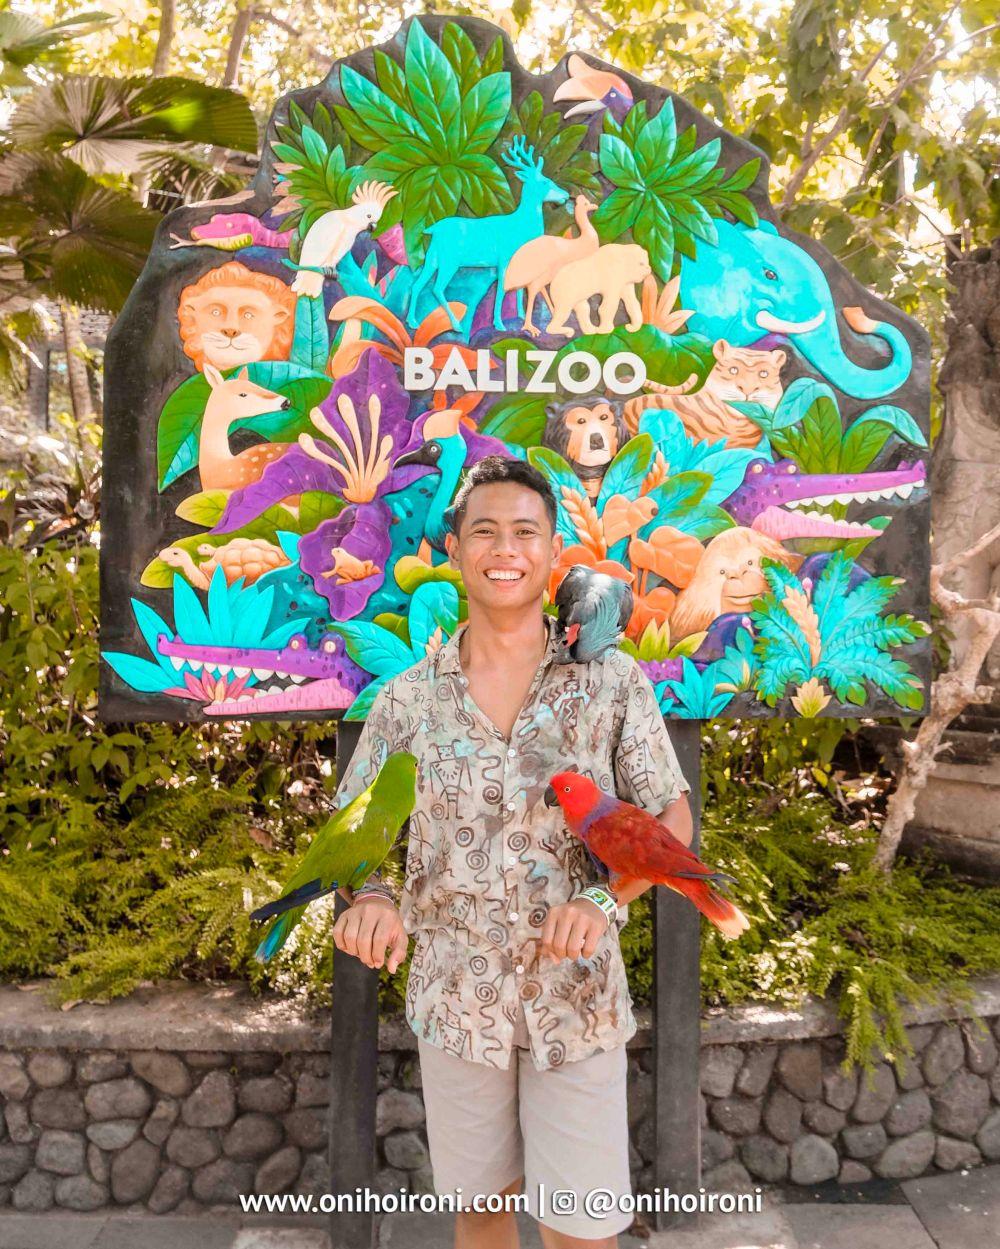 7 Bali Zoo Oni Hoironi Elephant mud fun